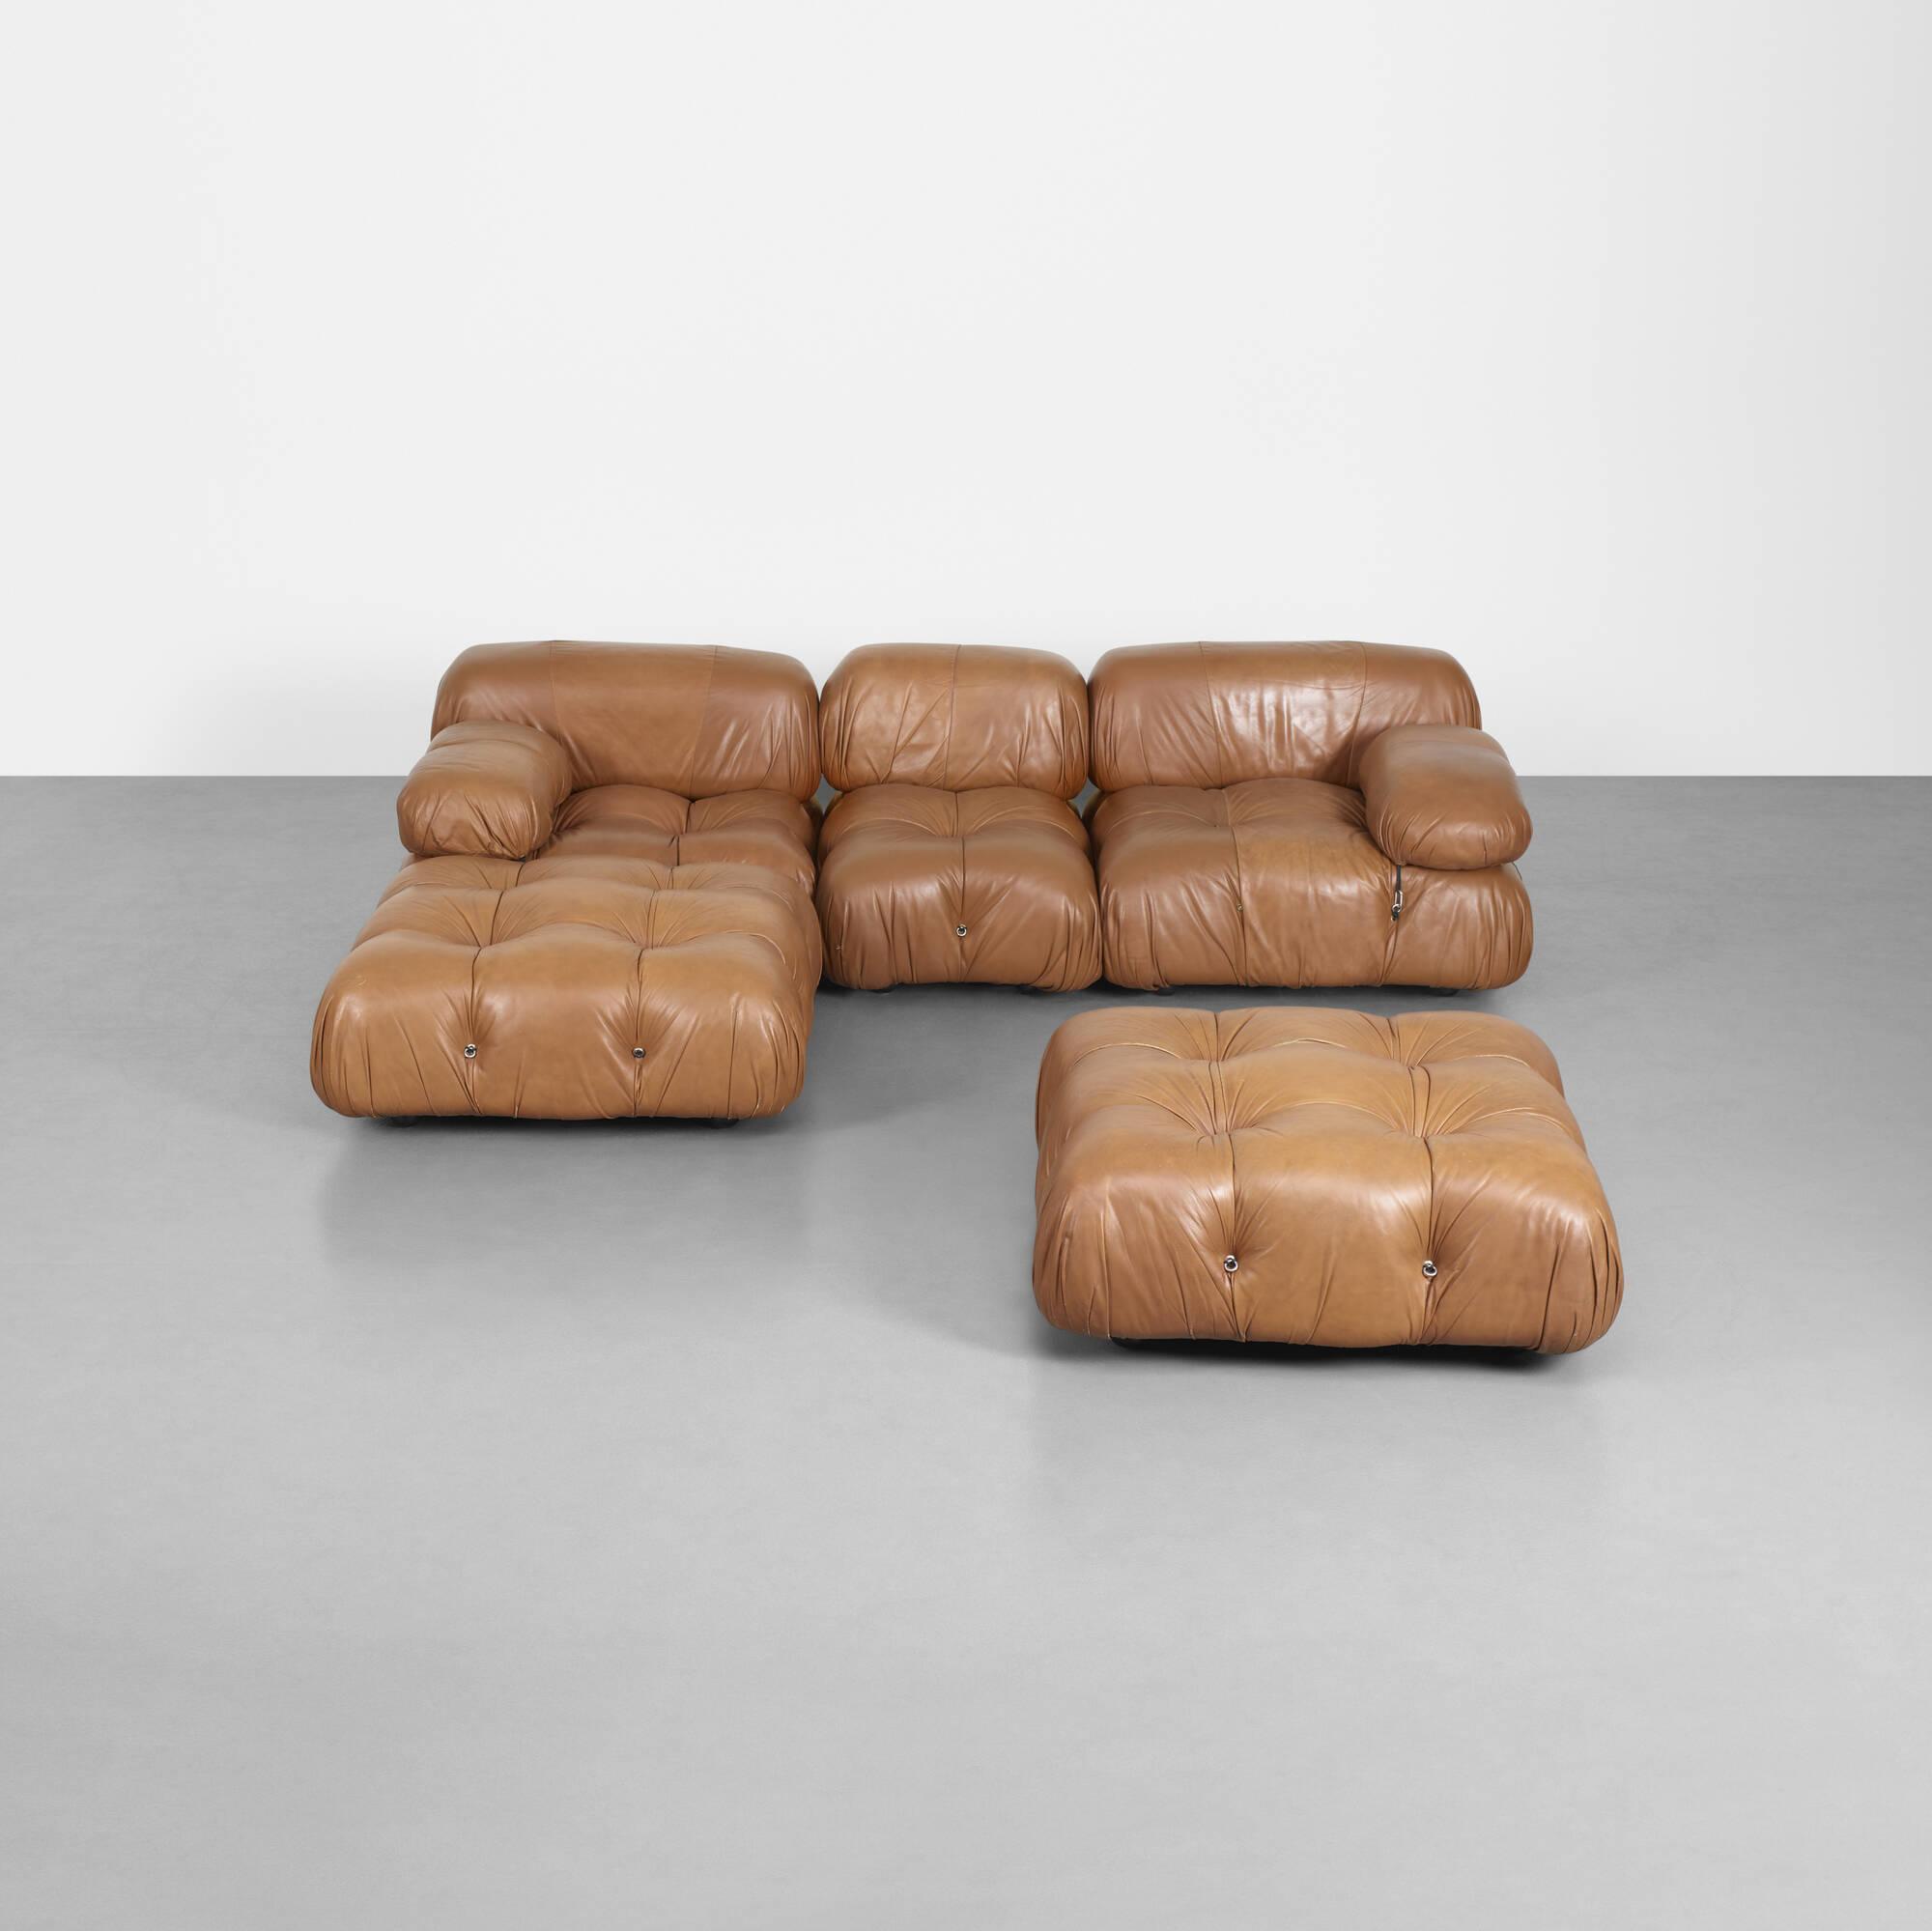 279 Mario Bellini Camaleonda modular sofa Design 24 March